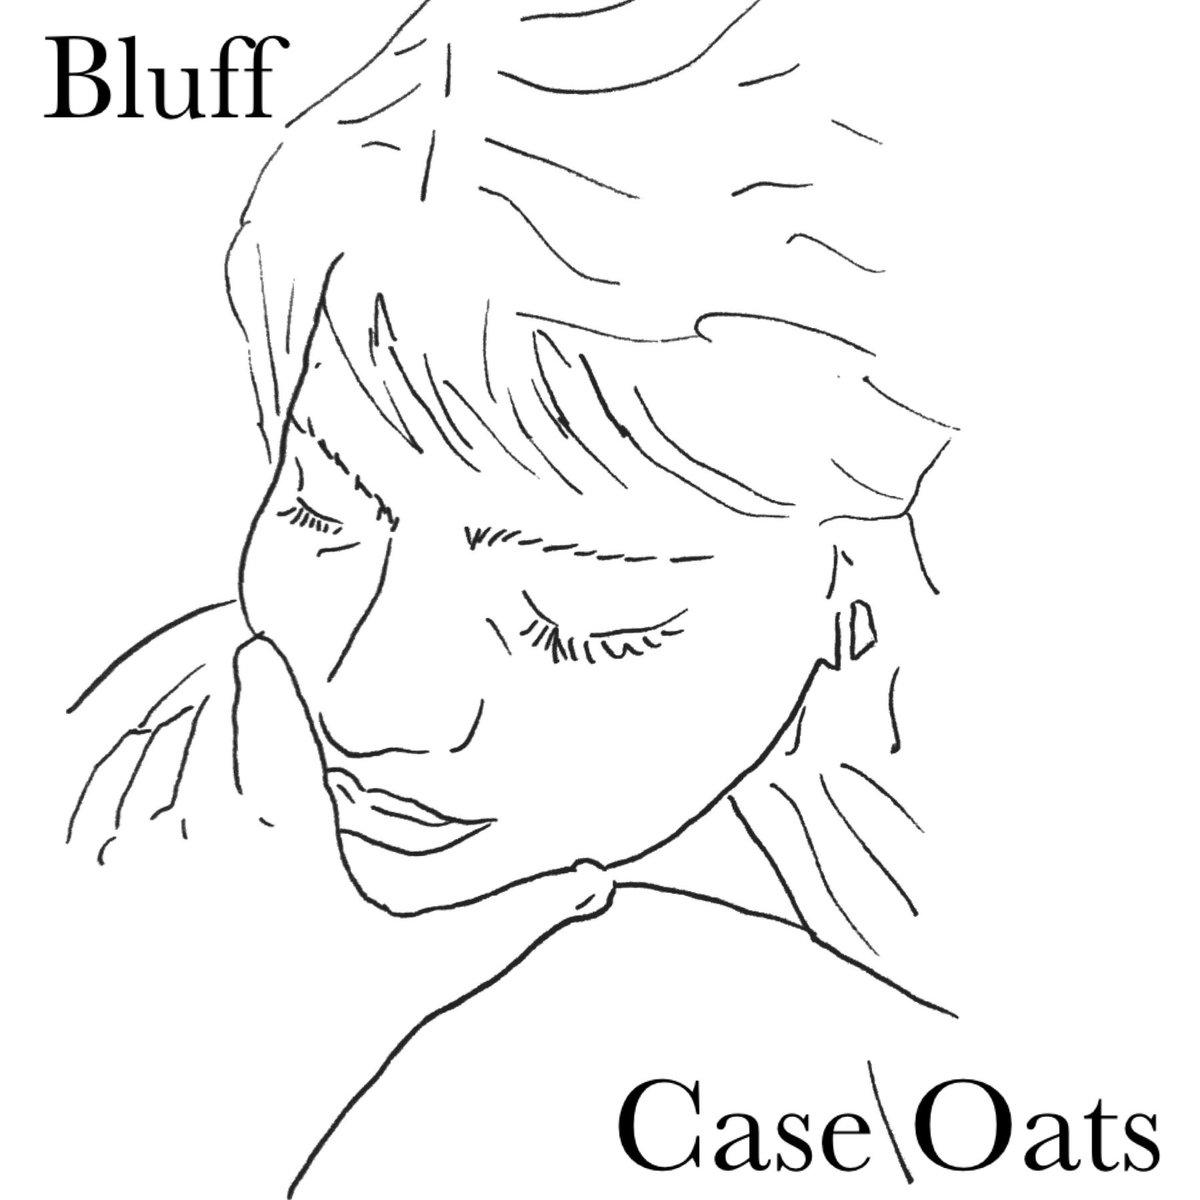 Bluff artwork